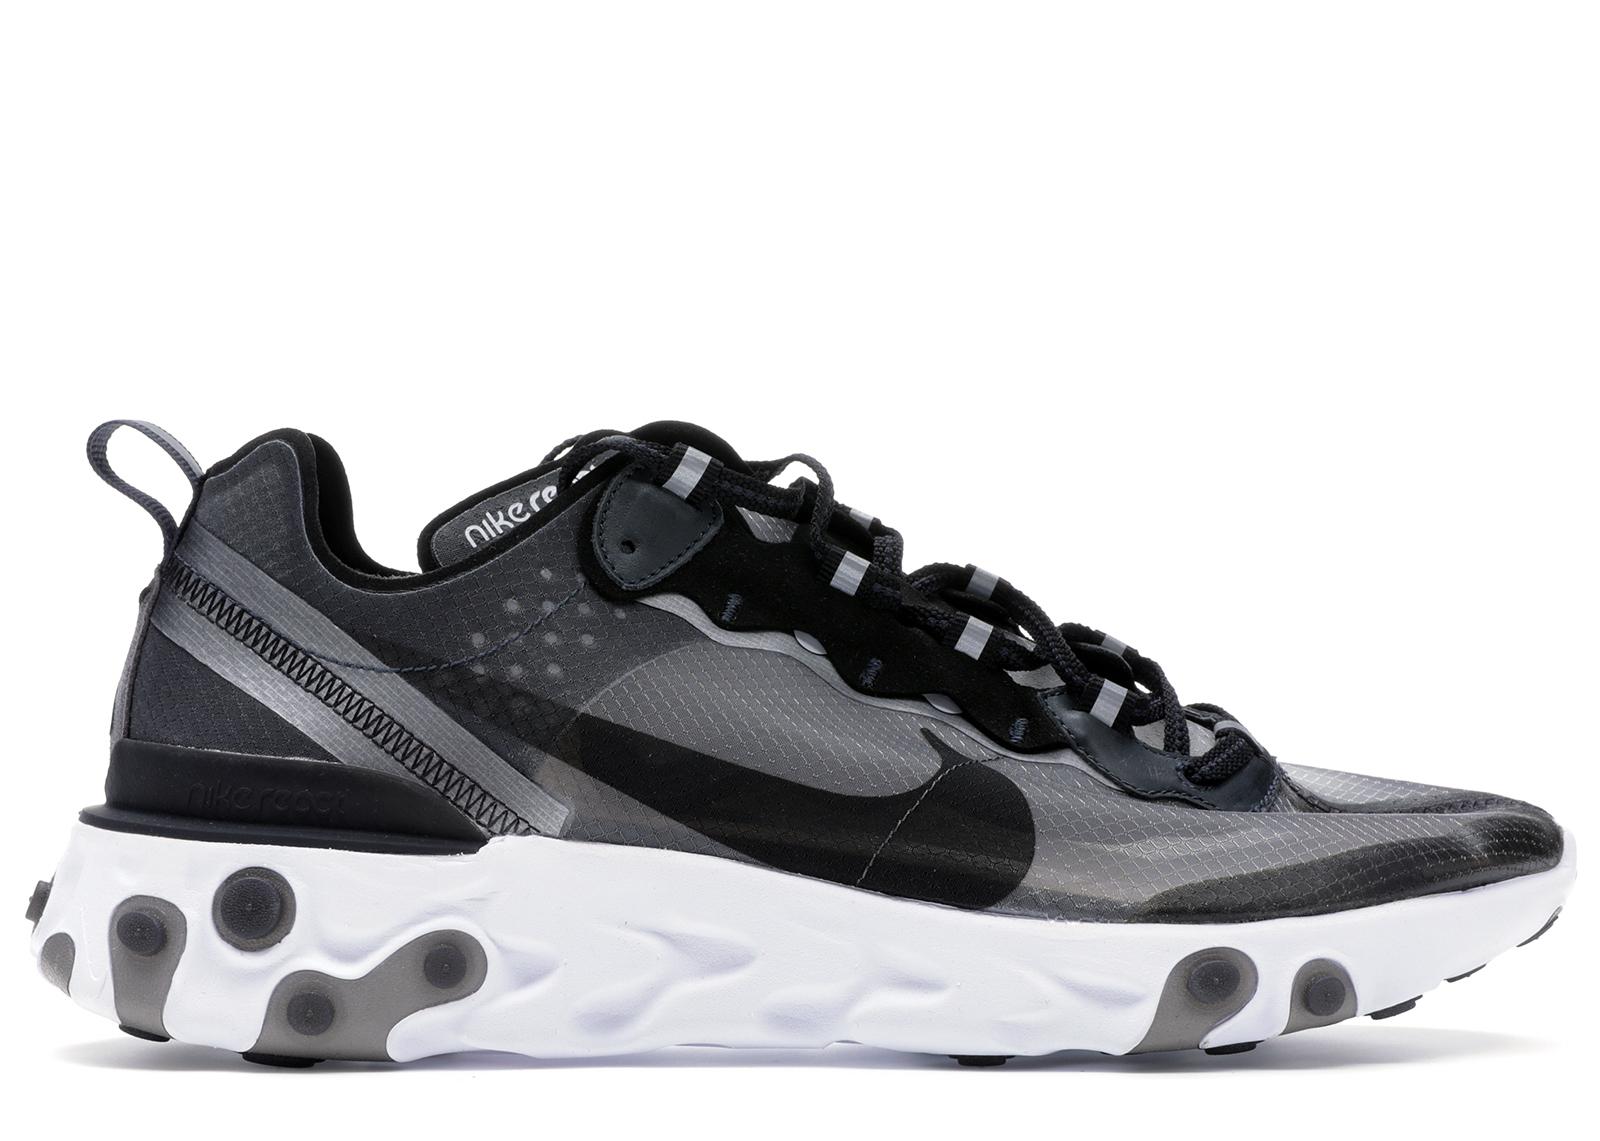 Nike React Element 87 Anthracite Black - AQ1090-001